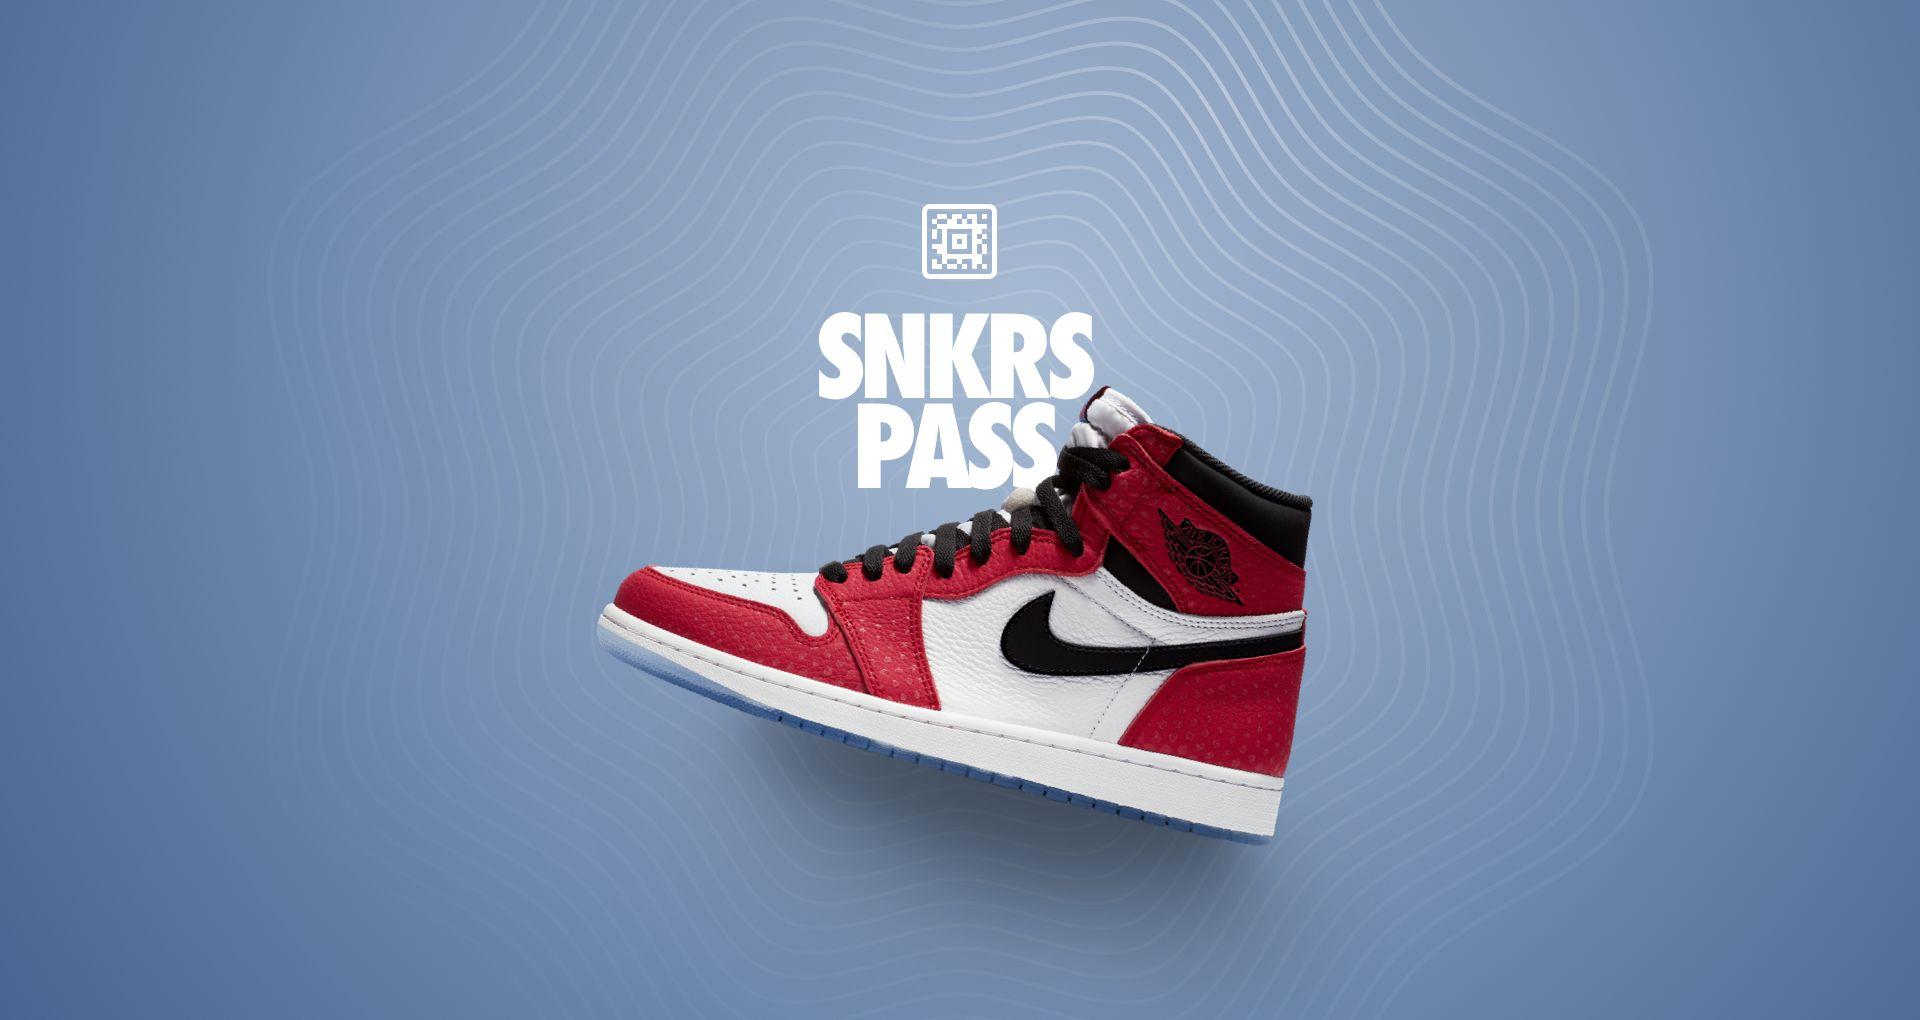 2323f785677 Air Jordan 1 'Origin Story' SNKRS Pass Nike NYC. Nike+ SNKRS